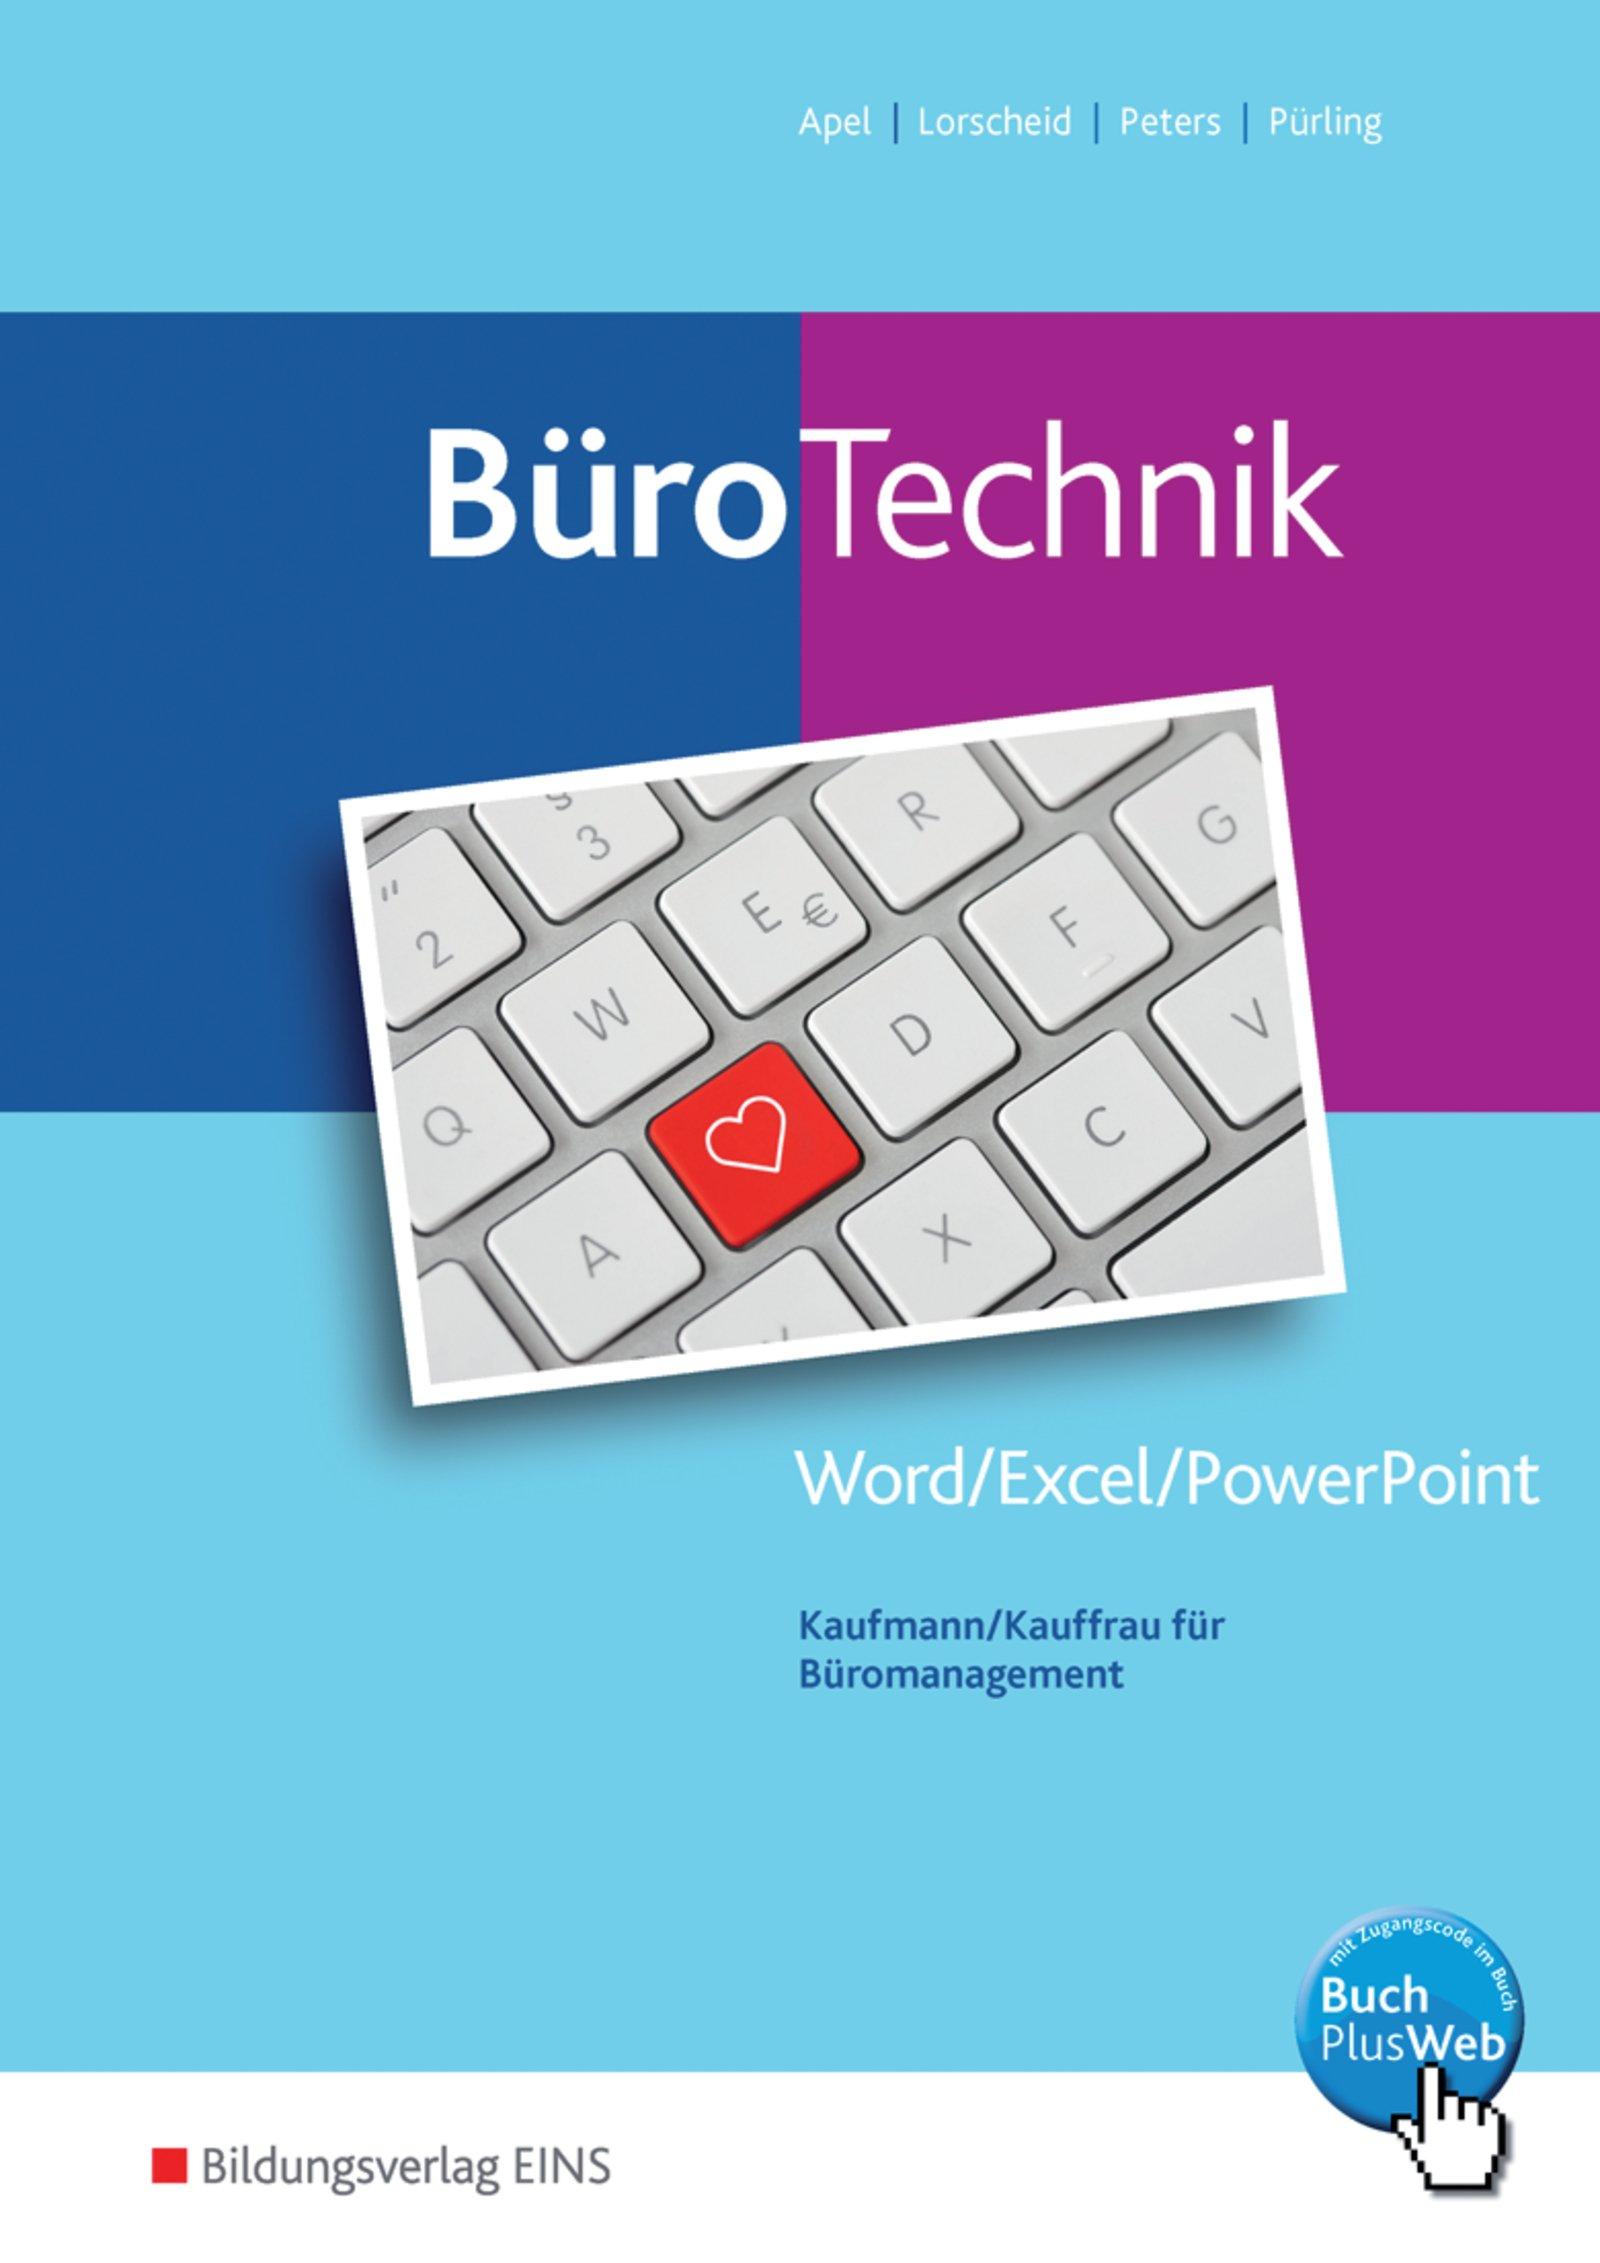 BüroWelt: BüroTechnik - Word / Excel / Powerpoint: Schülerband Taschenbuch – 1. Juni 2018 Olaf Apel Stefan Lorscheid Markus Peters Elvira Puerling